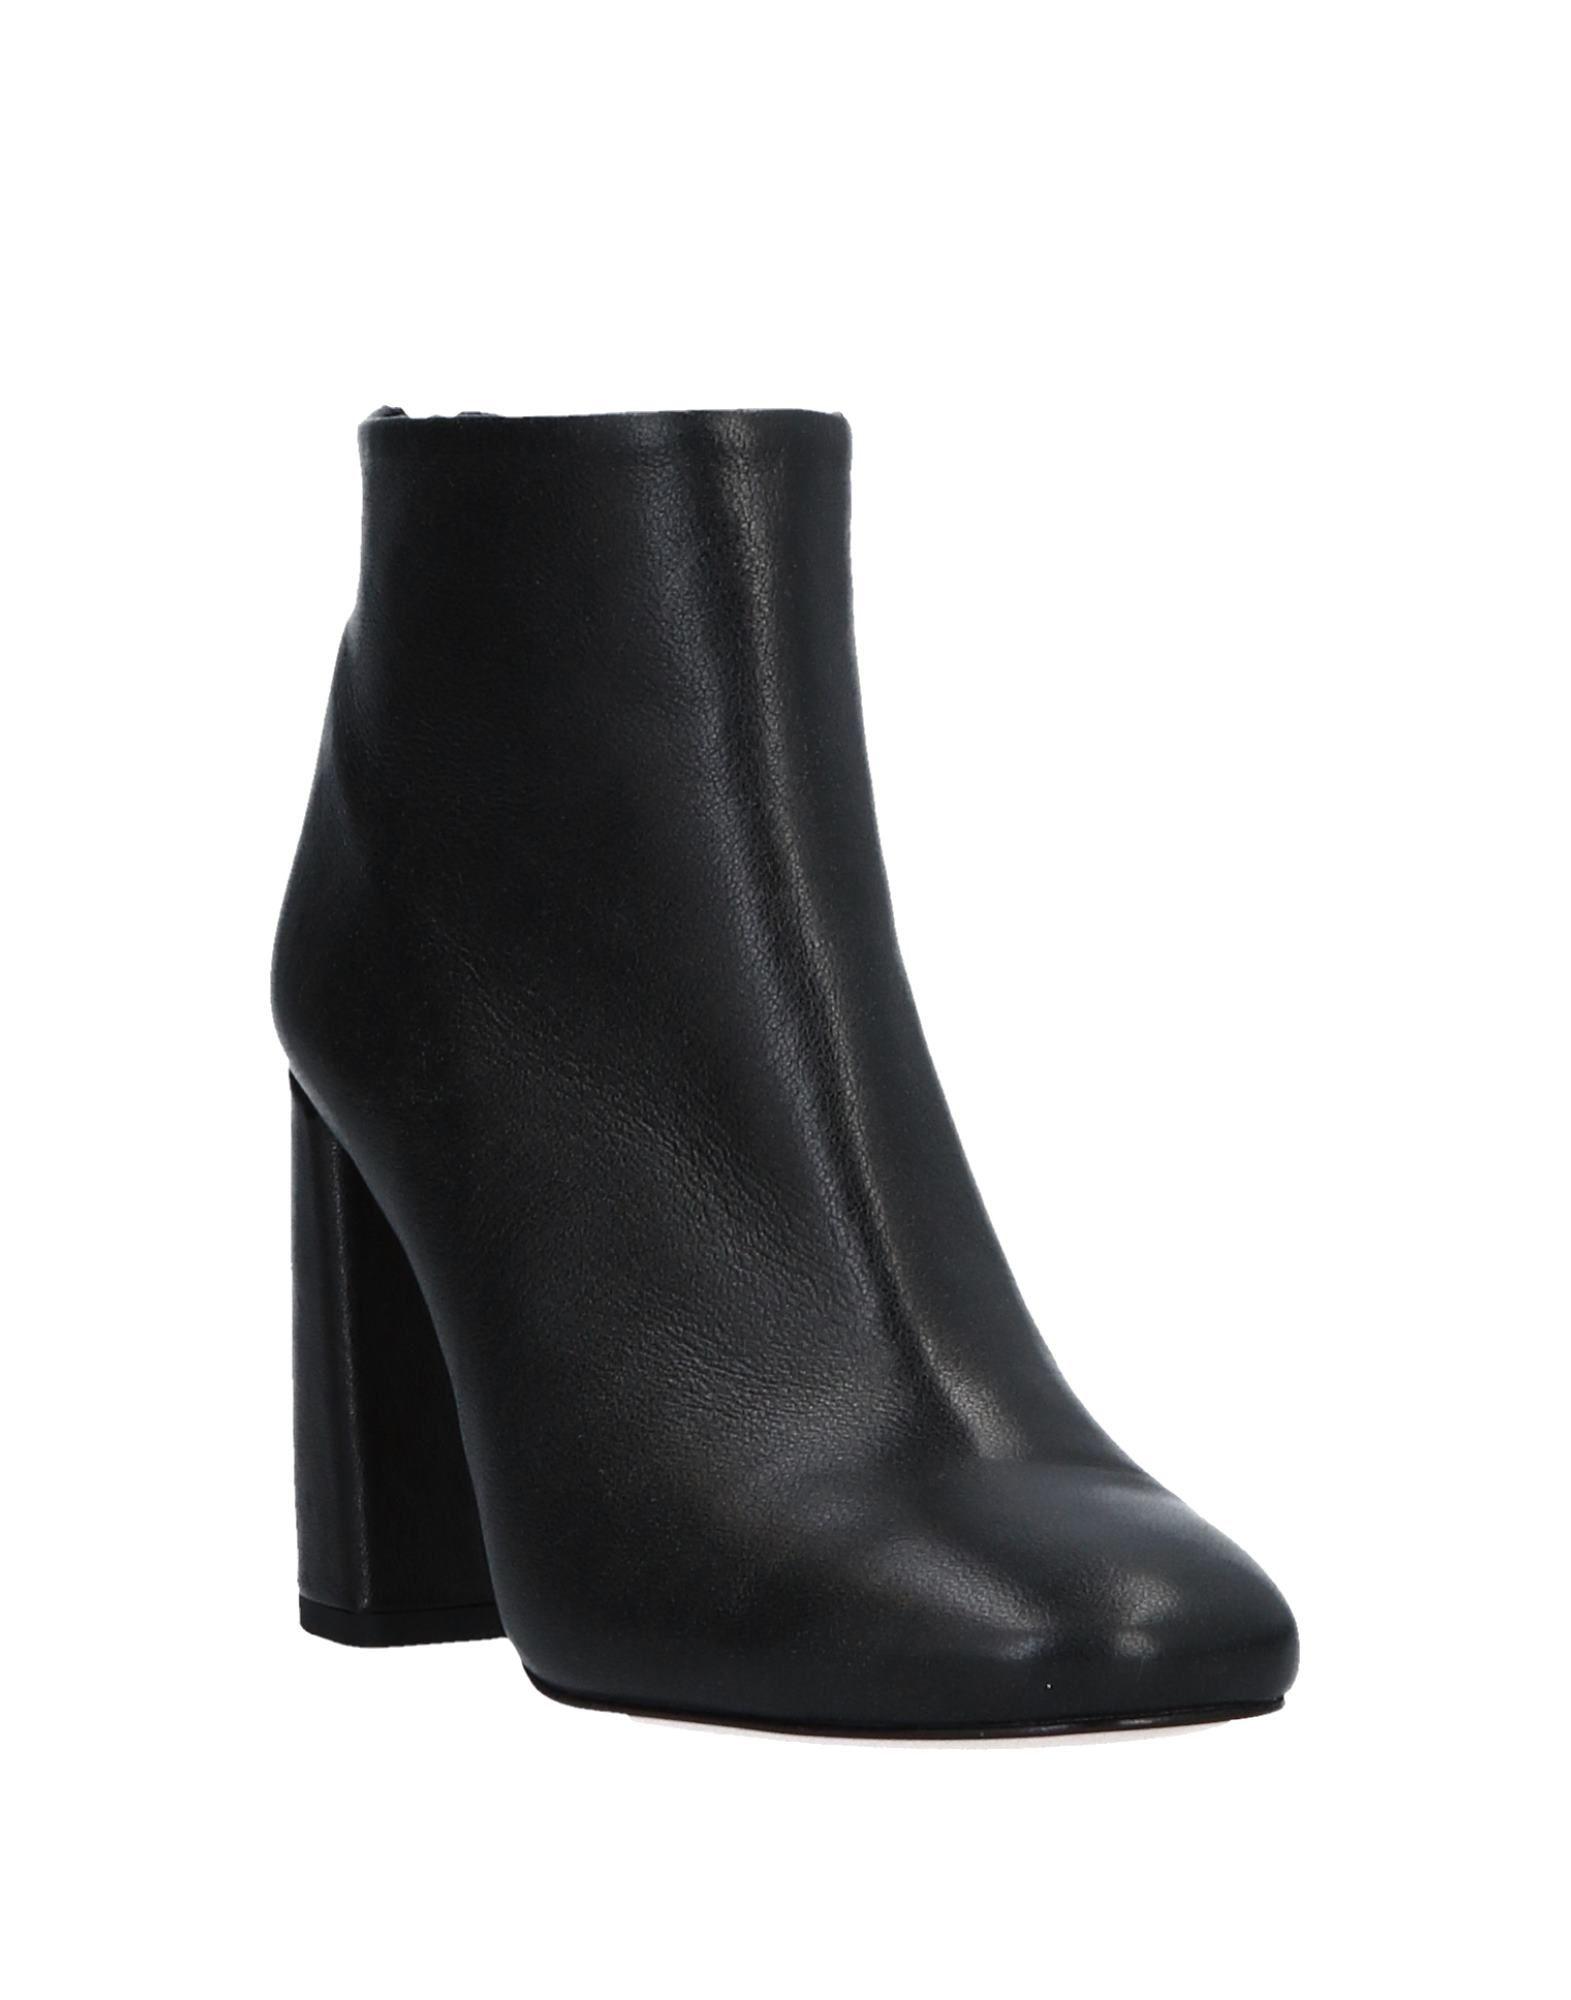 By 11517633BUGut A. Stiefelette Damen  11517633BUGut By aussehende strapazierfähige Schuhe 123359